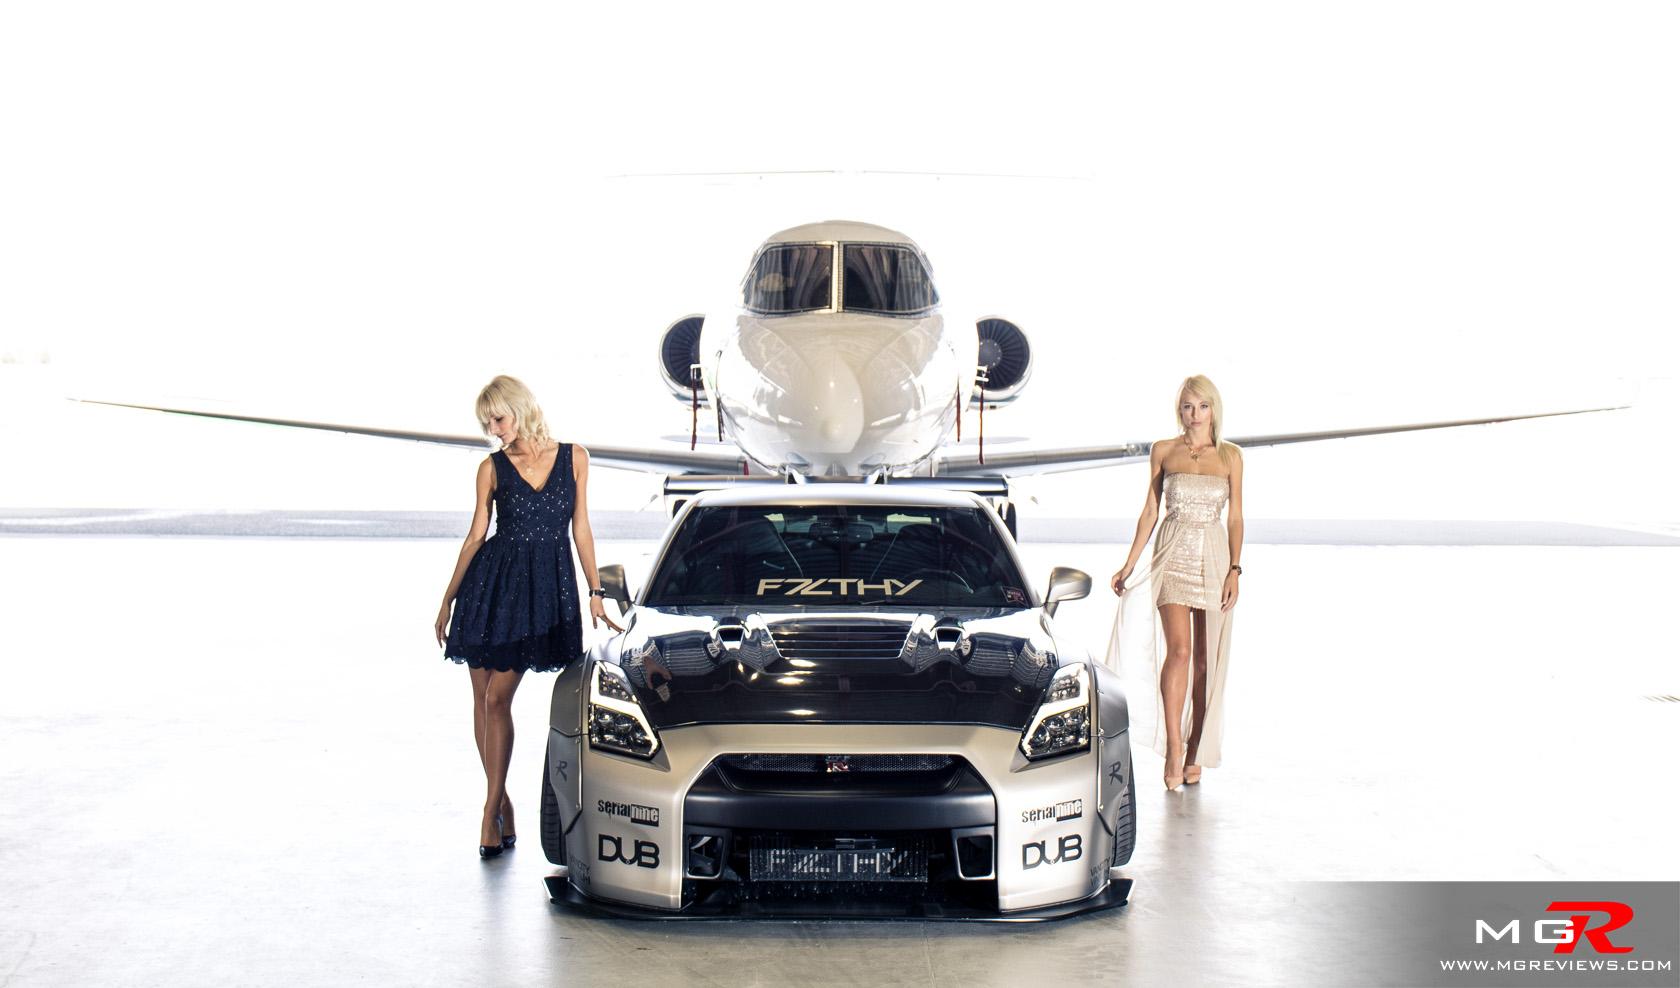 Photos 2013 Nissan Gtr Modified Mgreviews Rare Gt R Advertisements